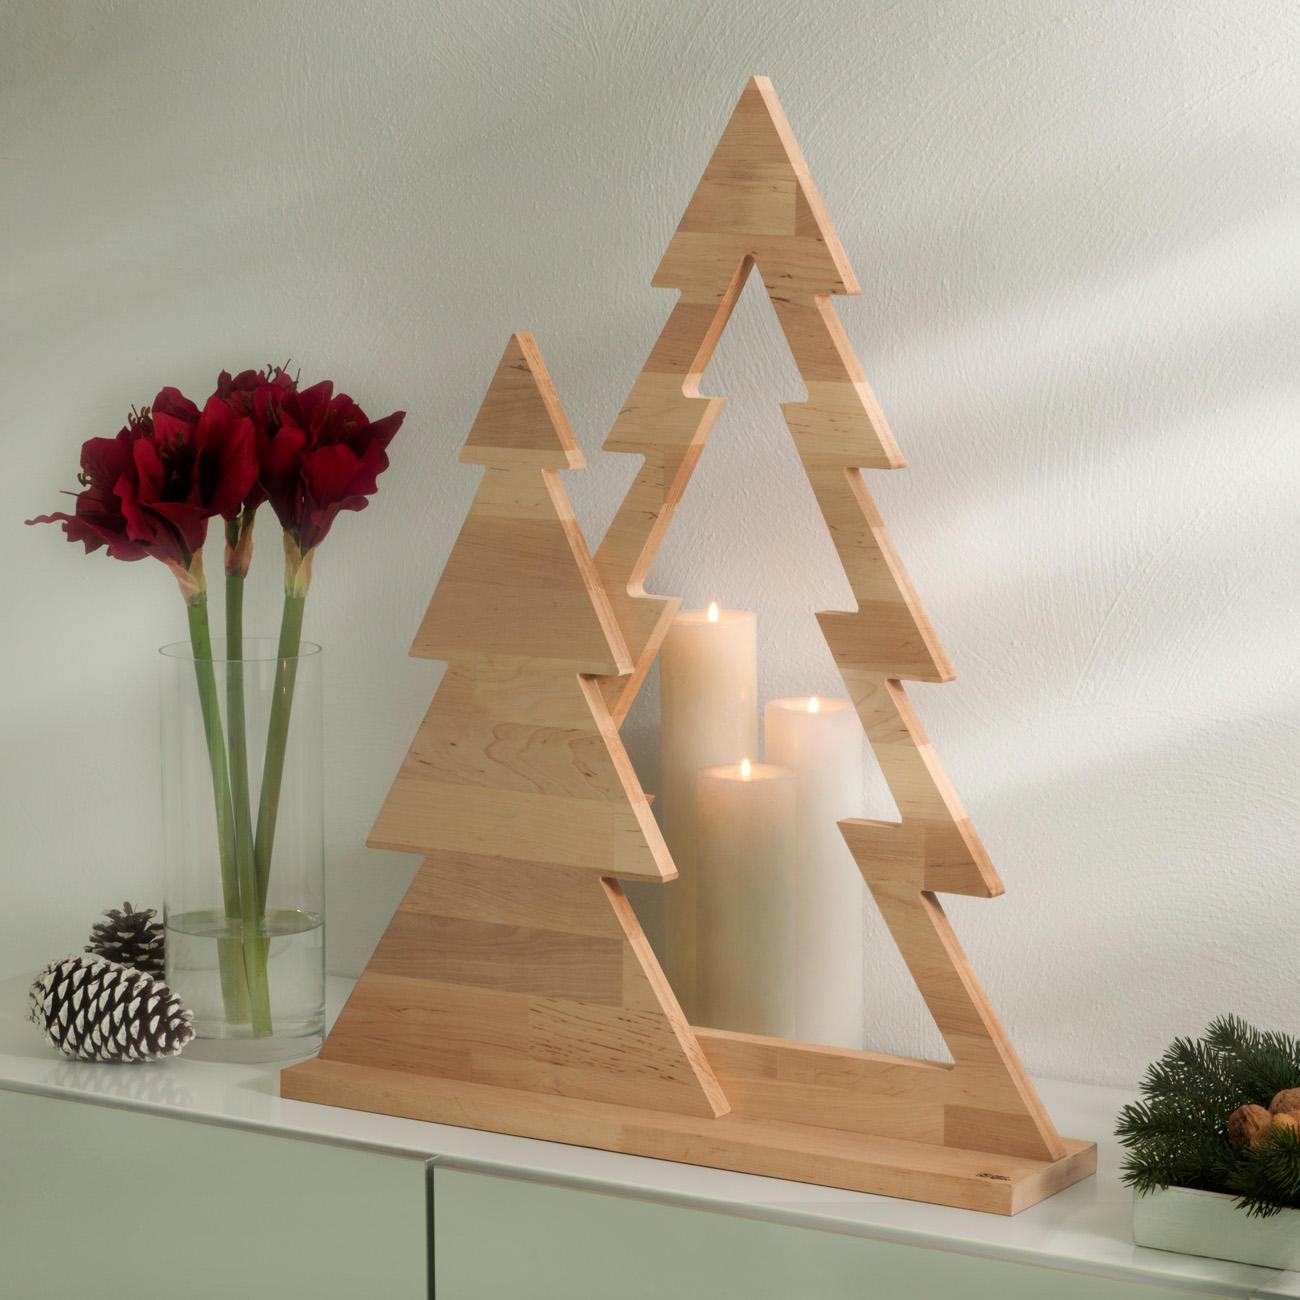 erlenholz deko tannenbaum 72 cm h he online kaufen. Black Bedroom Furniture Sets. Home Design Ideas